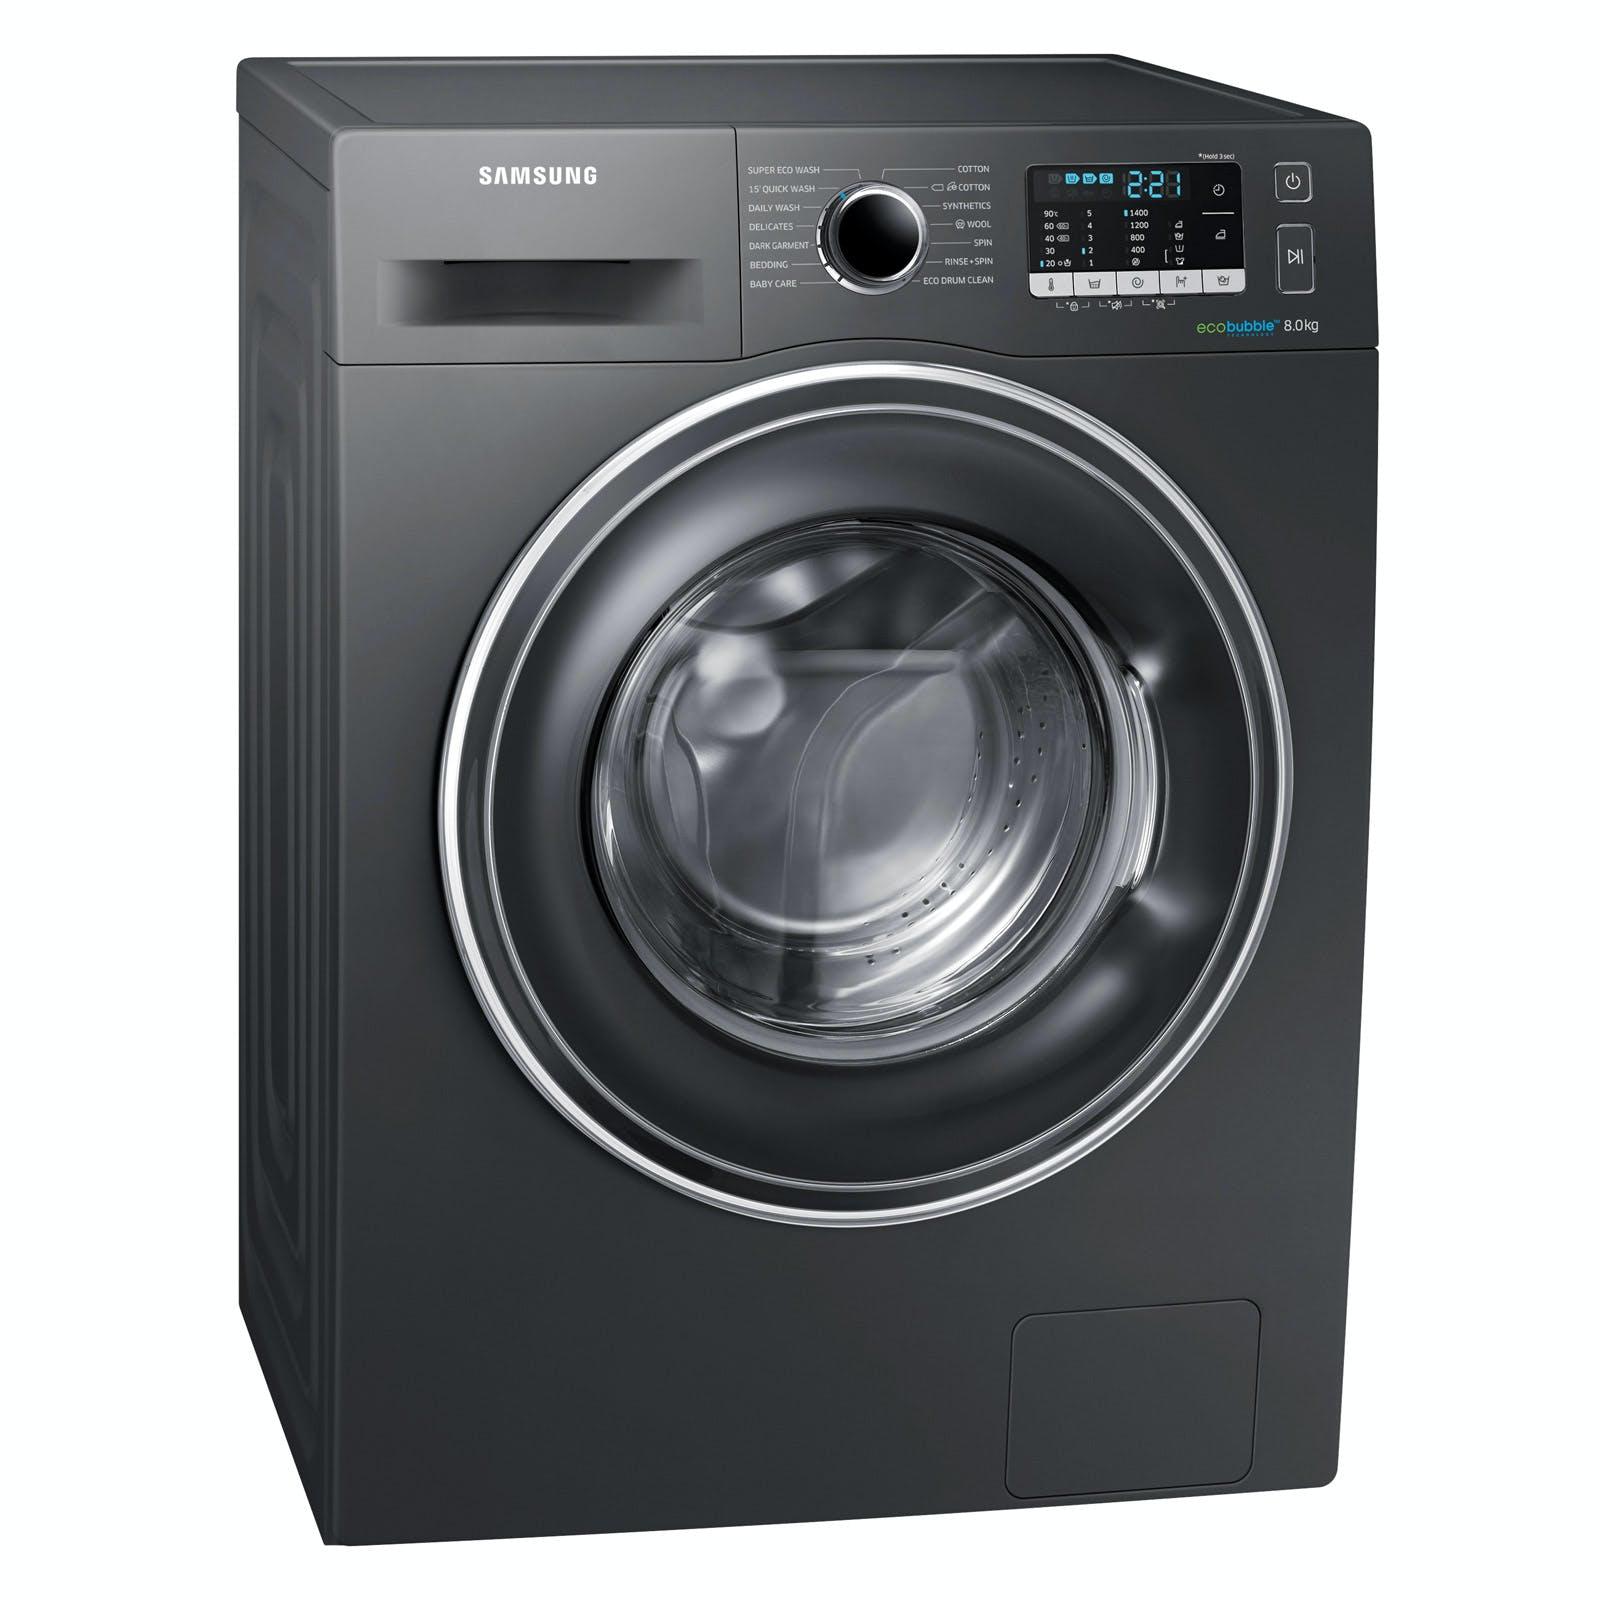 samsung ww80j5555ex eco bubble washing machine in graphite 1400rpm 8kg a. Black Bedroom Furniture Sets. Home Design Ideas